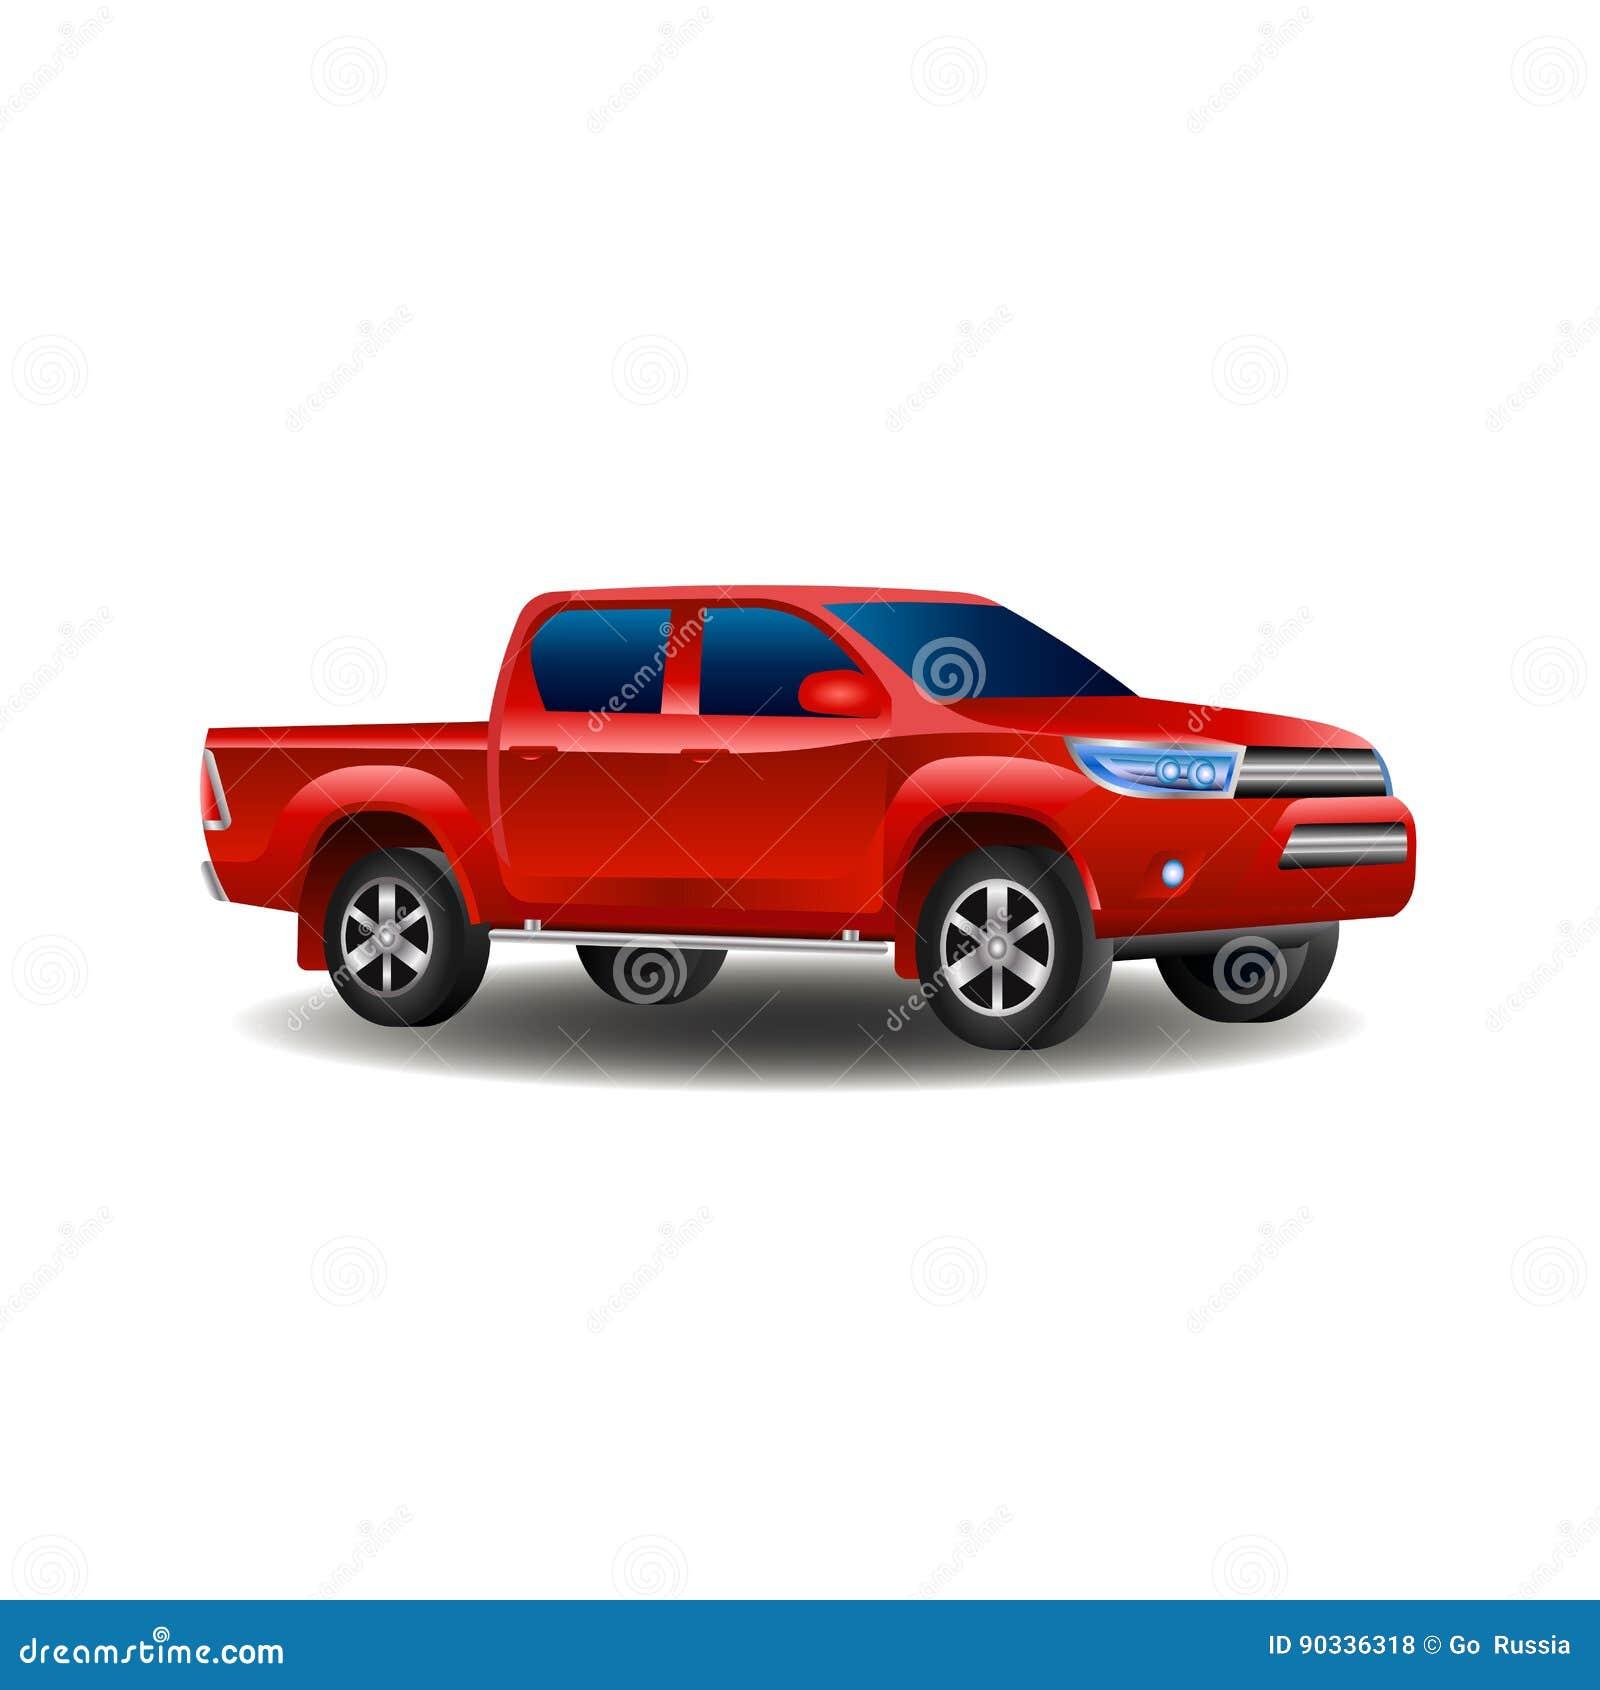 Camionete Vermelho 4x4 Isolado Na Ilustracao Branca Do Vetor Do Fundo Ilustracao Do Vetor Ilustracao De Camionete Vermelho 90336318